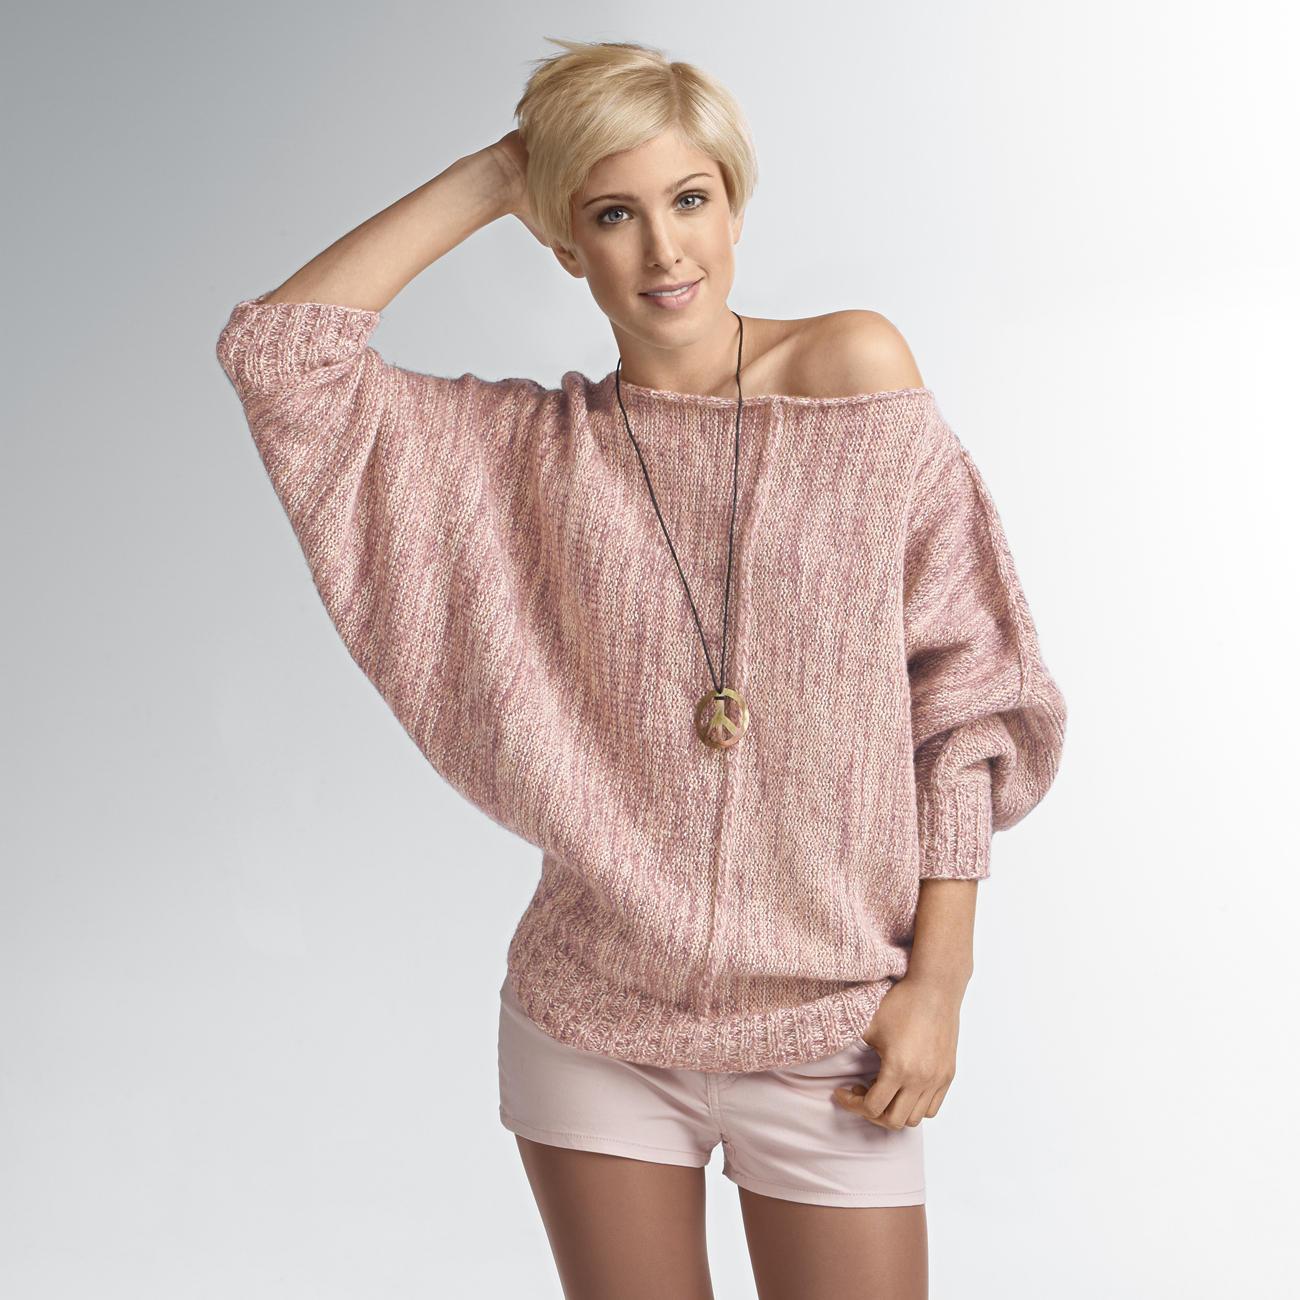 modell 266 3 poncho pullover aus inverno von junghans wolle damenpullover strickmodelle. Black Bedroom Furniture Sets. Home Design Ideas